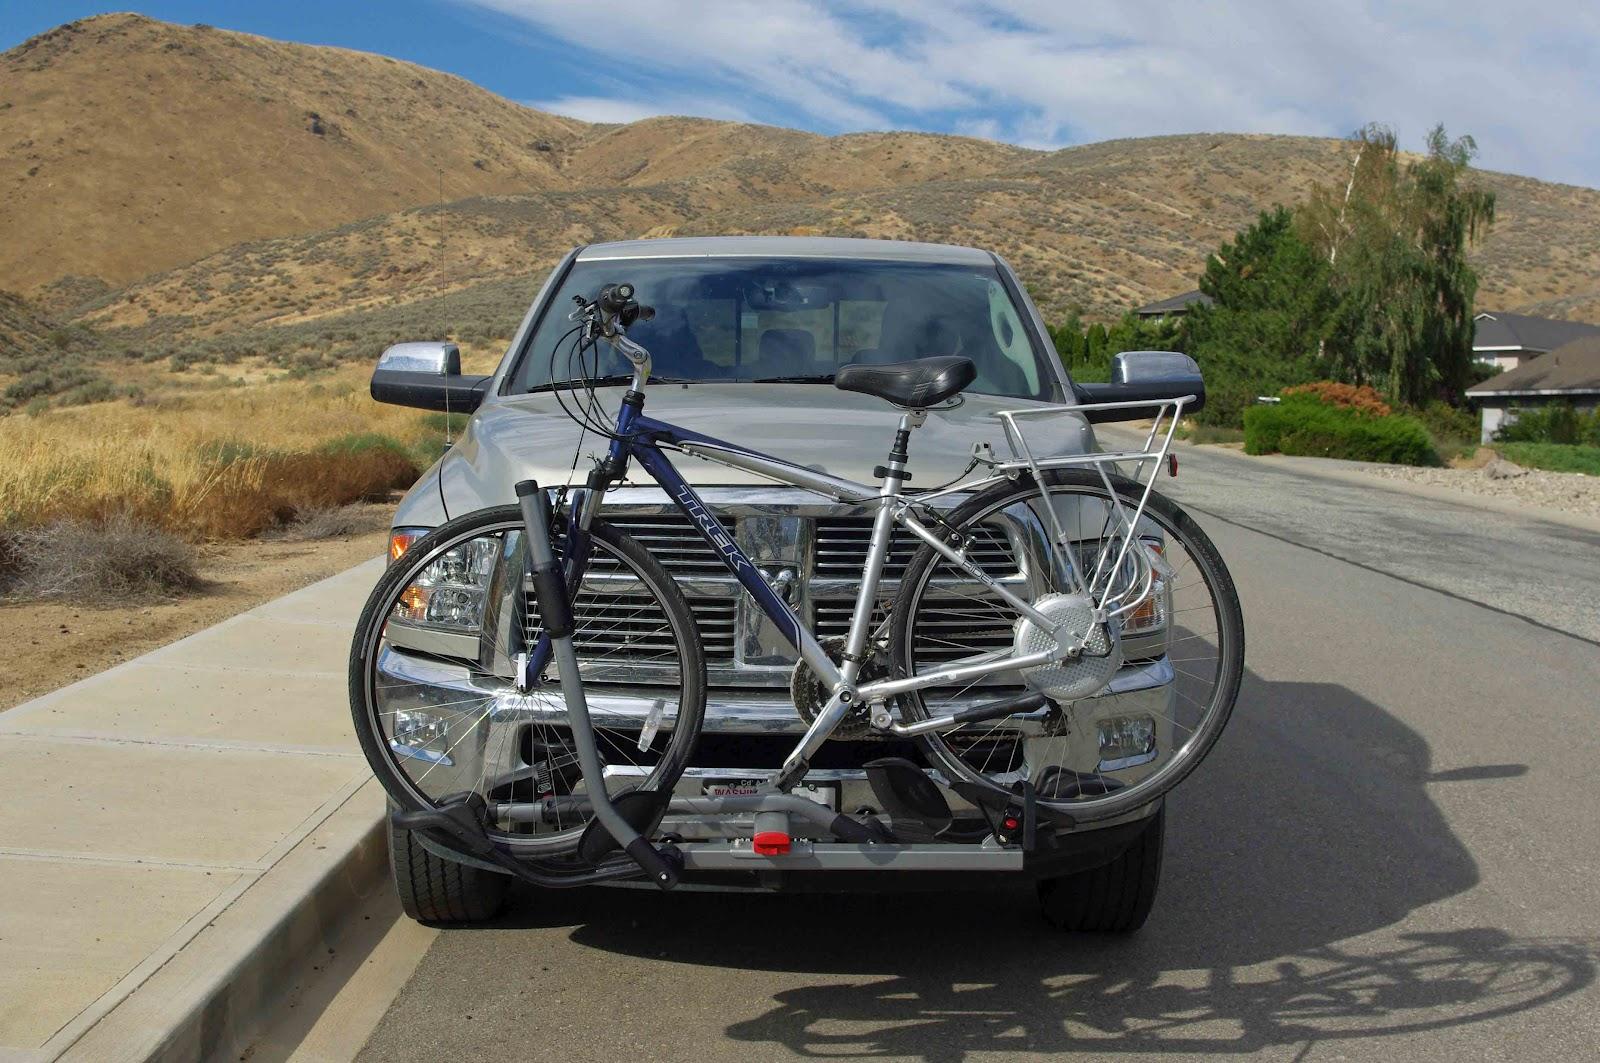 Yakima Holdup 2 >> usbackroads™: usbackroads product-Yakima HoldUp Bike Rack